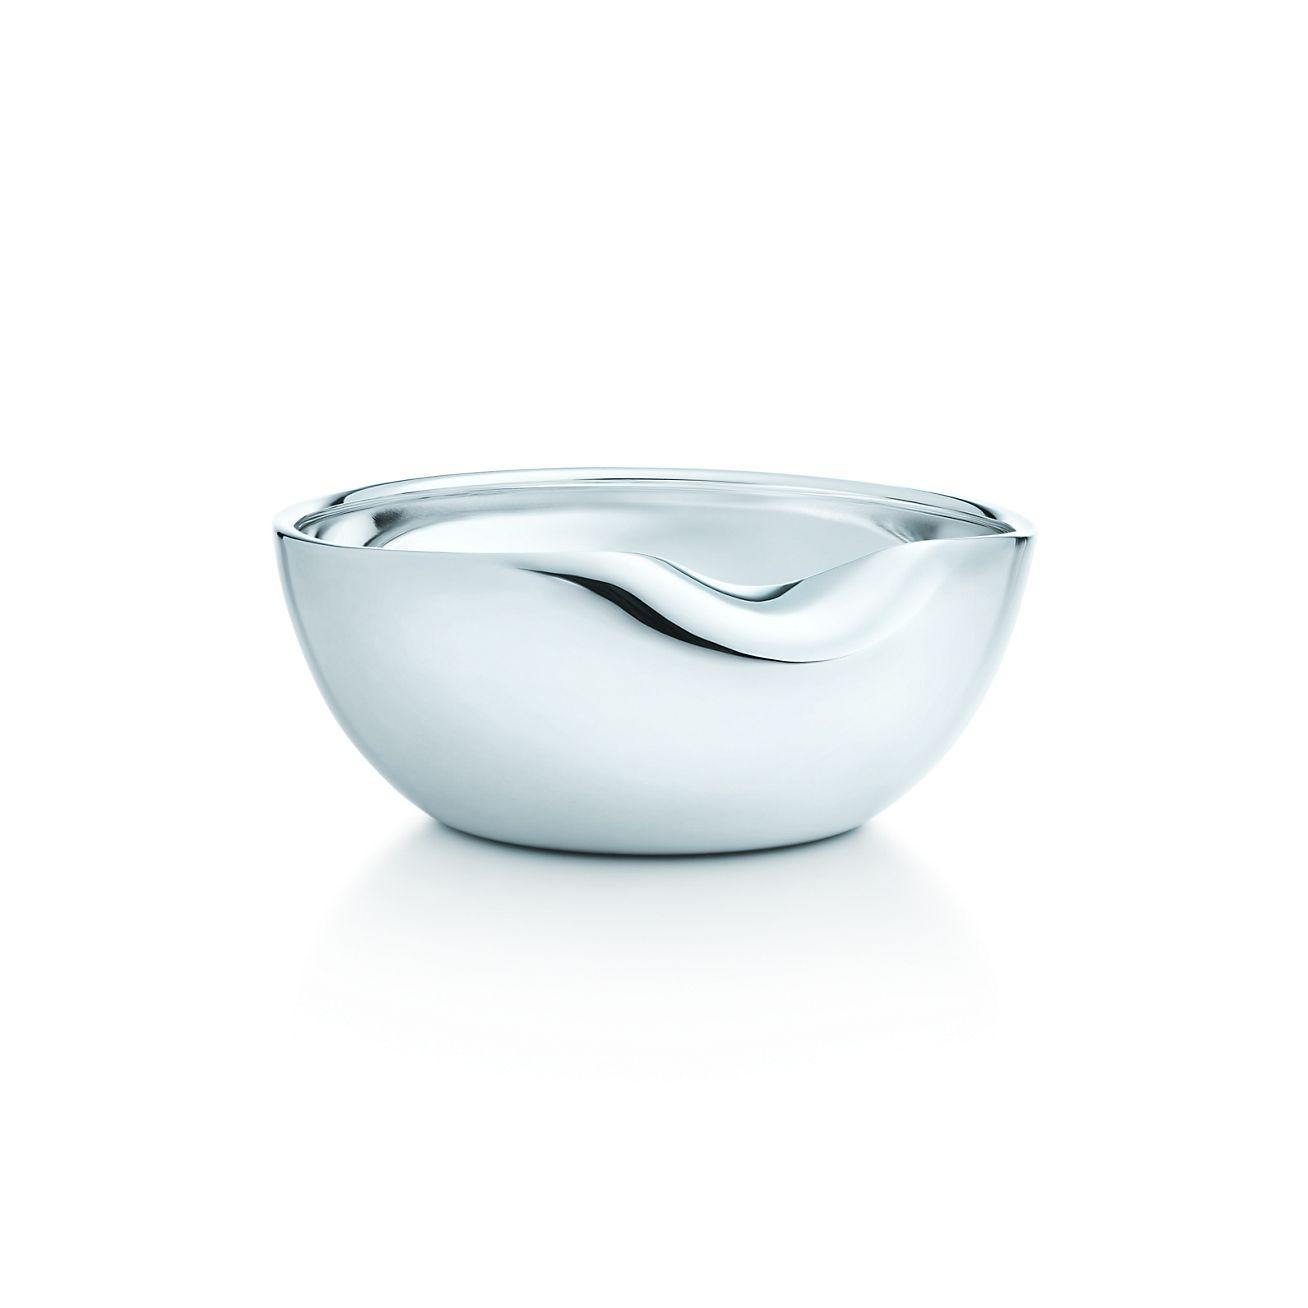 Elsa Peretti 174 Thumbprint Bowl In Sterling Silver 3 5